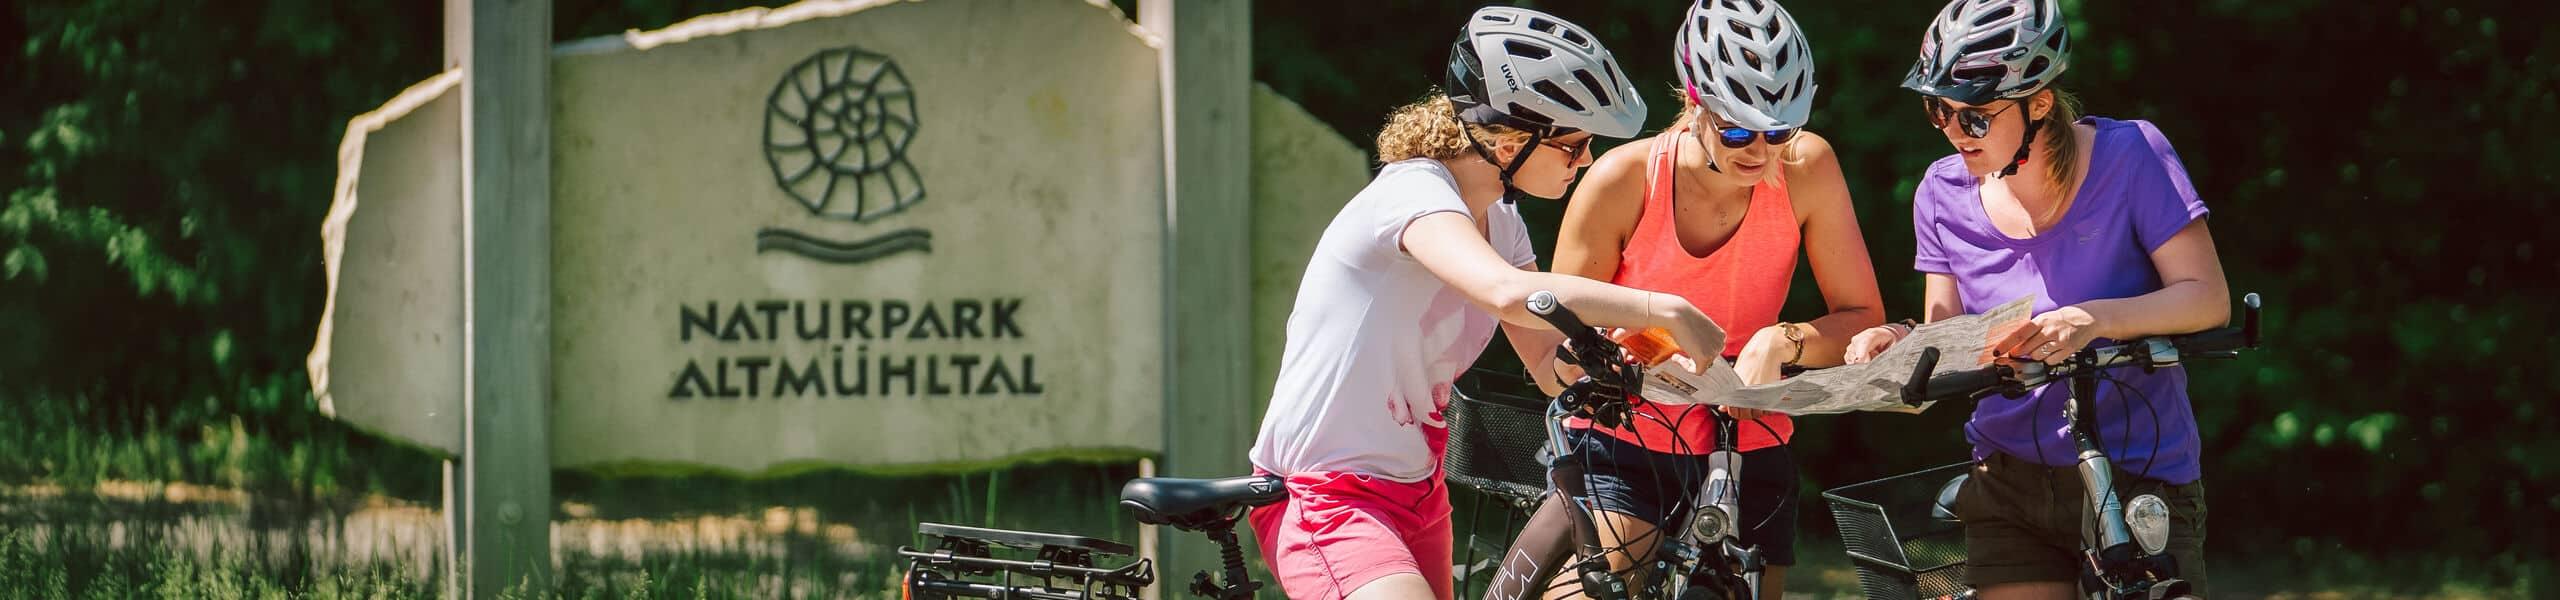 Radfahrer im Naturpark Altmühltal bei Beilngries